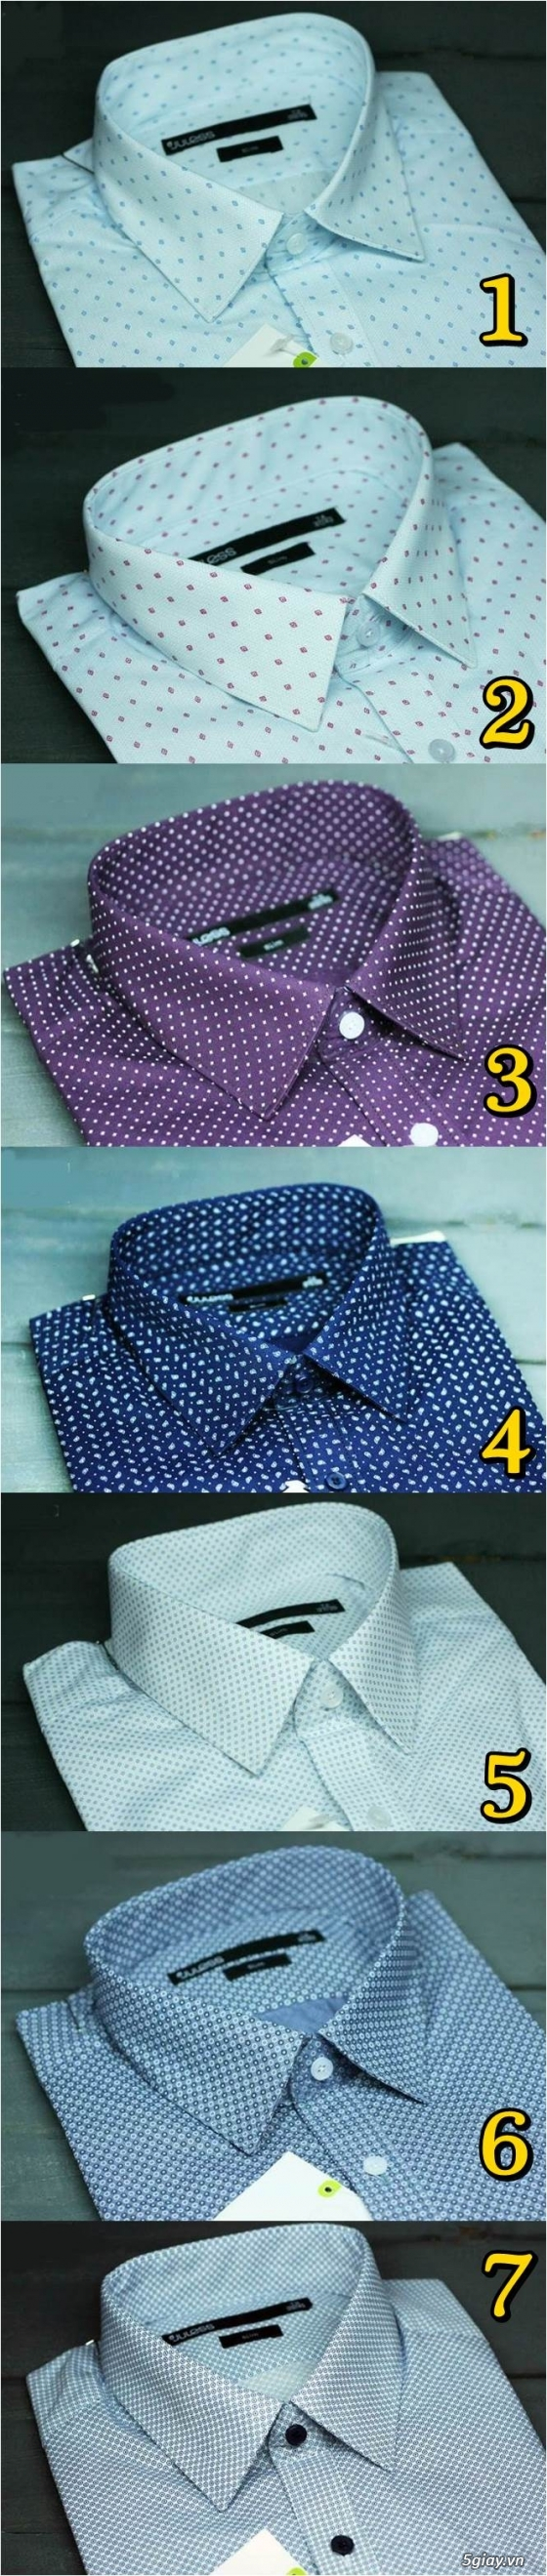 Áo thun Hollister VNXK,áo thun SuperDry VNXK ,áo A&F VNXK ,áo thun cổ tim thun láng - 20